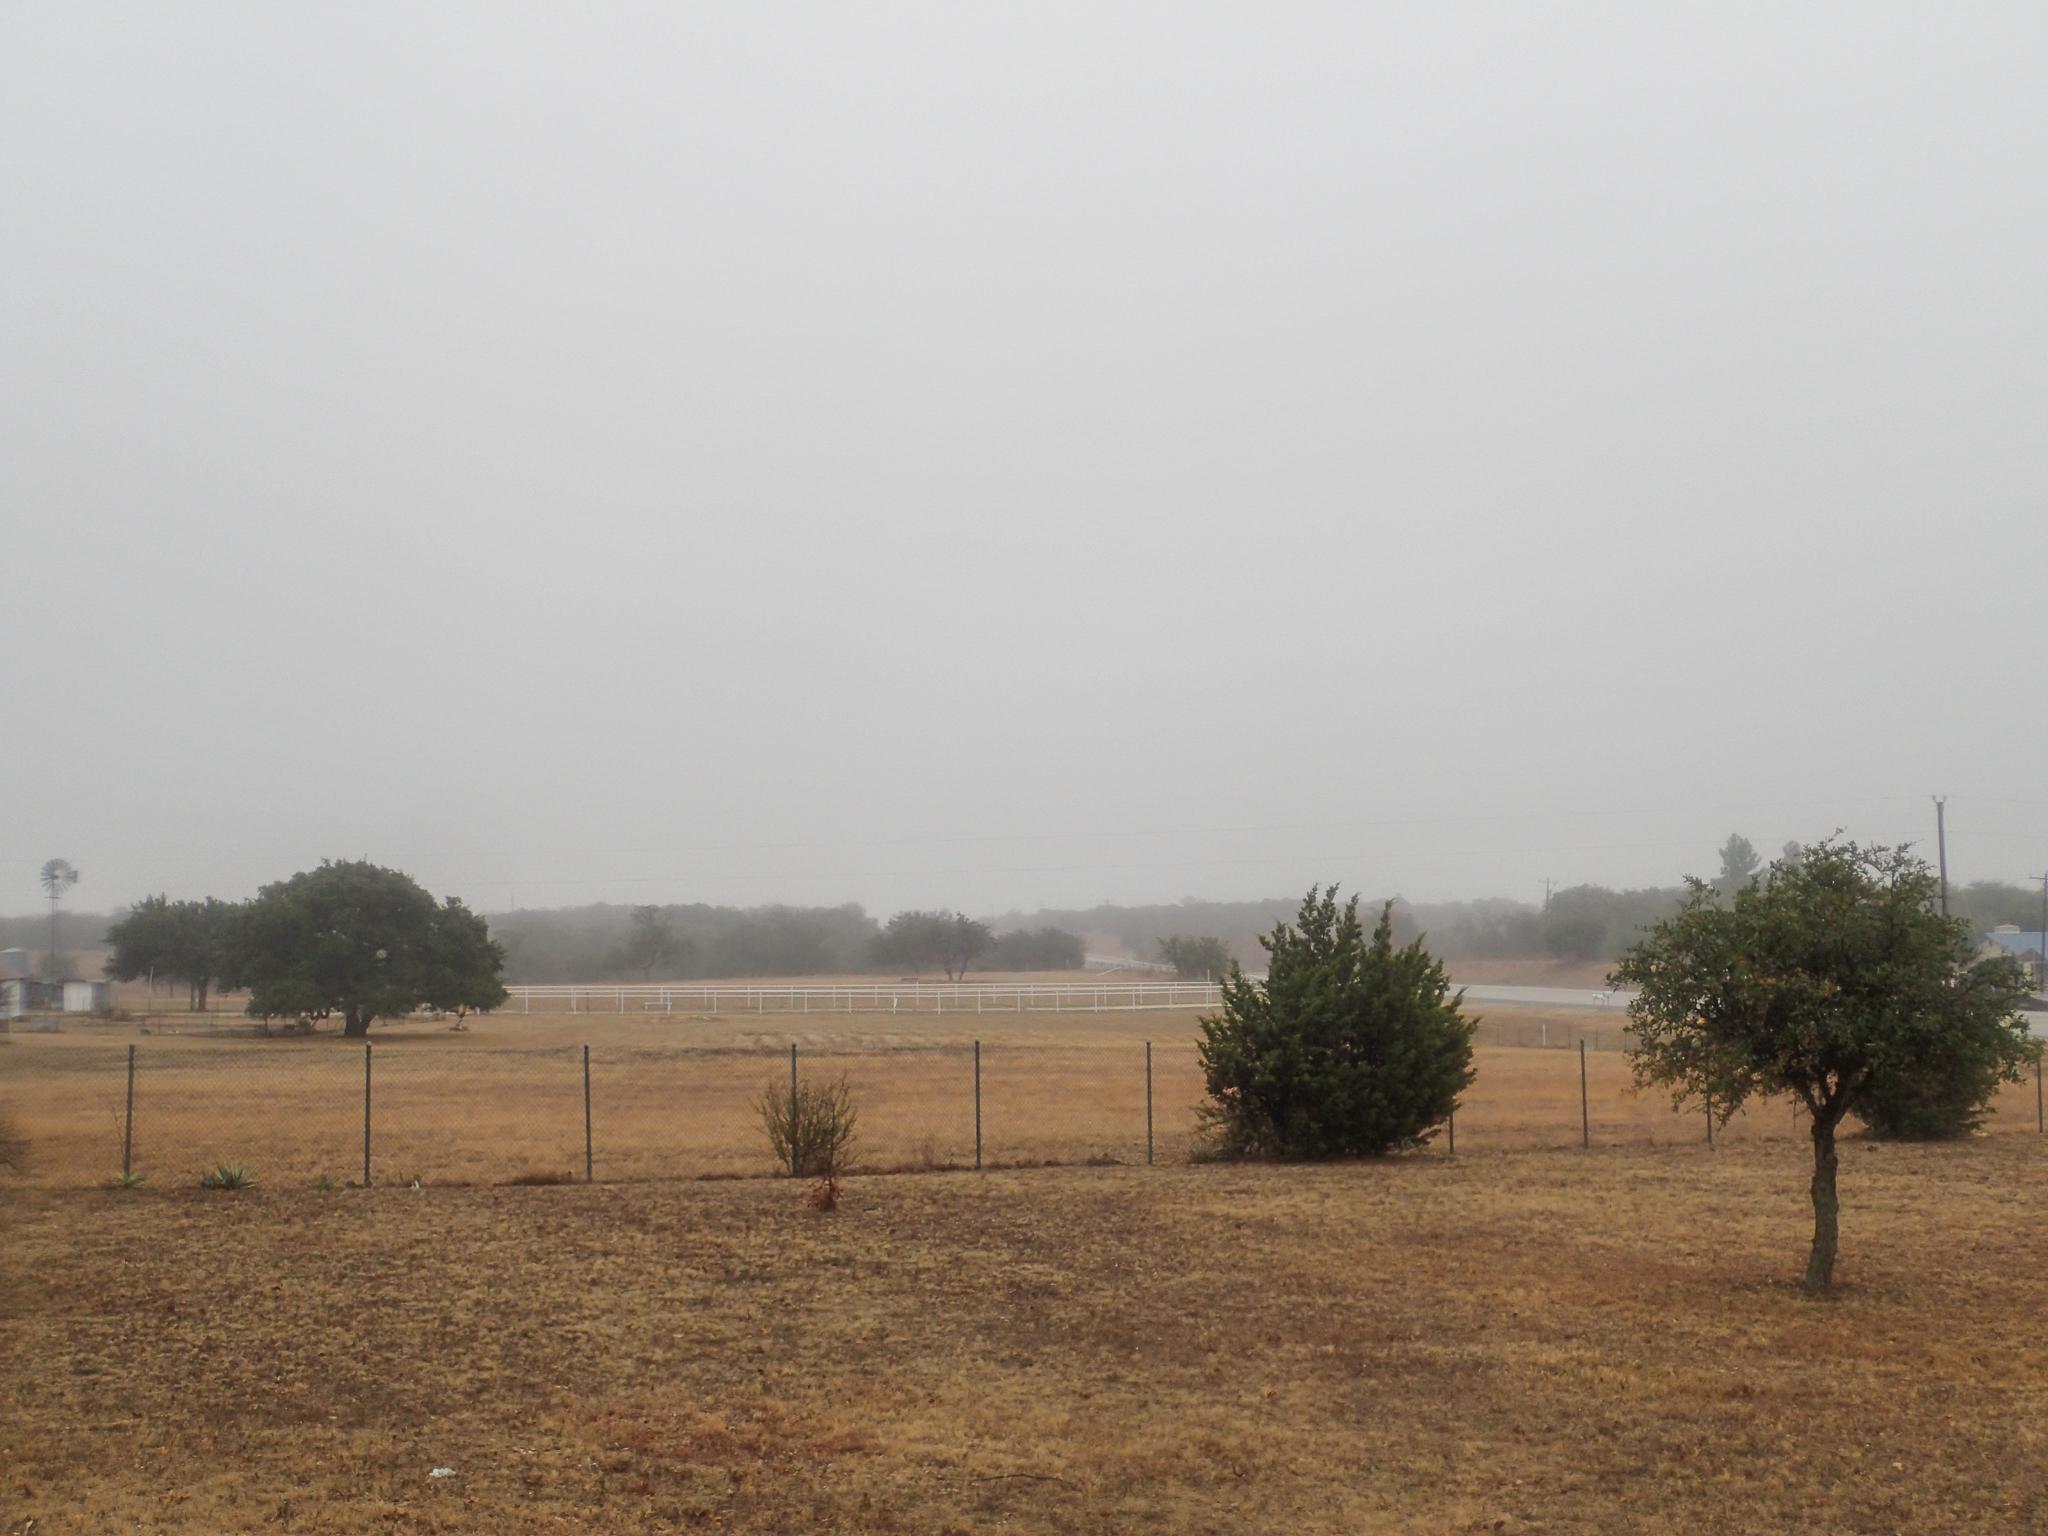 Overcast and damp, Texas